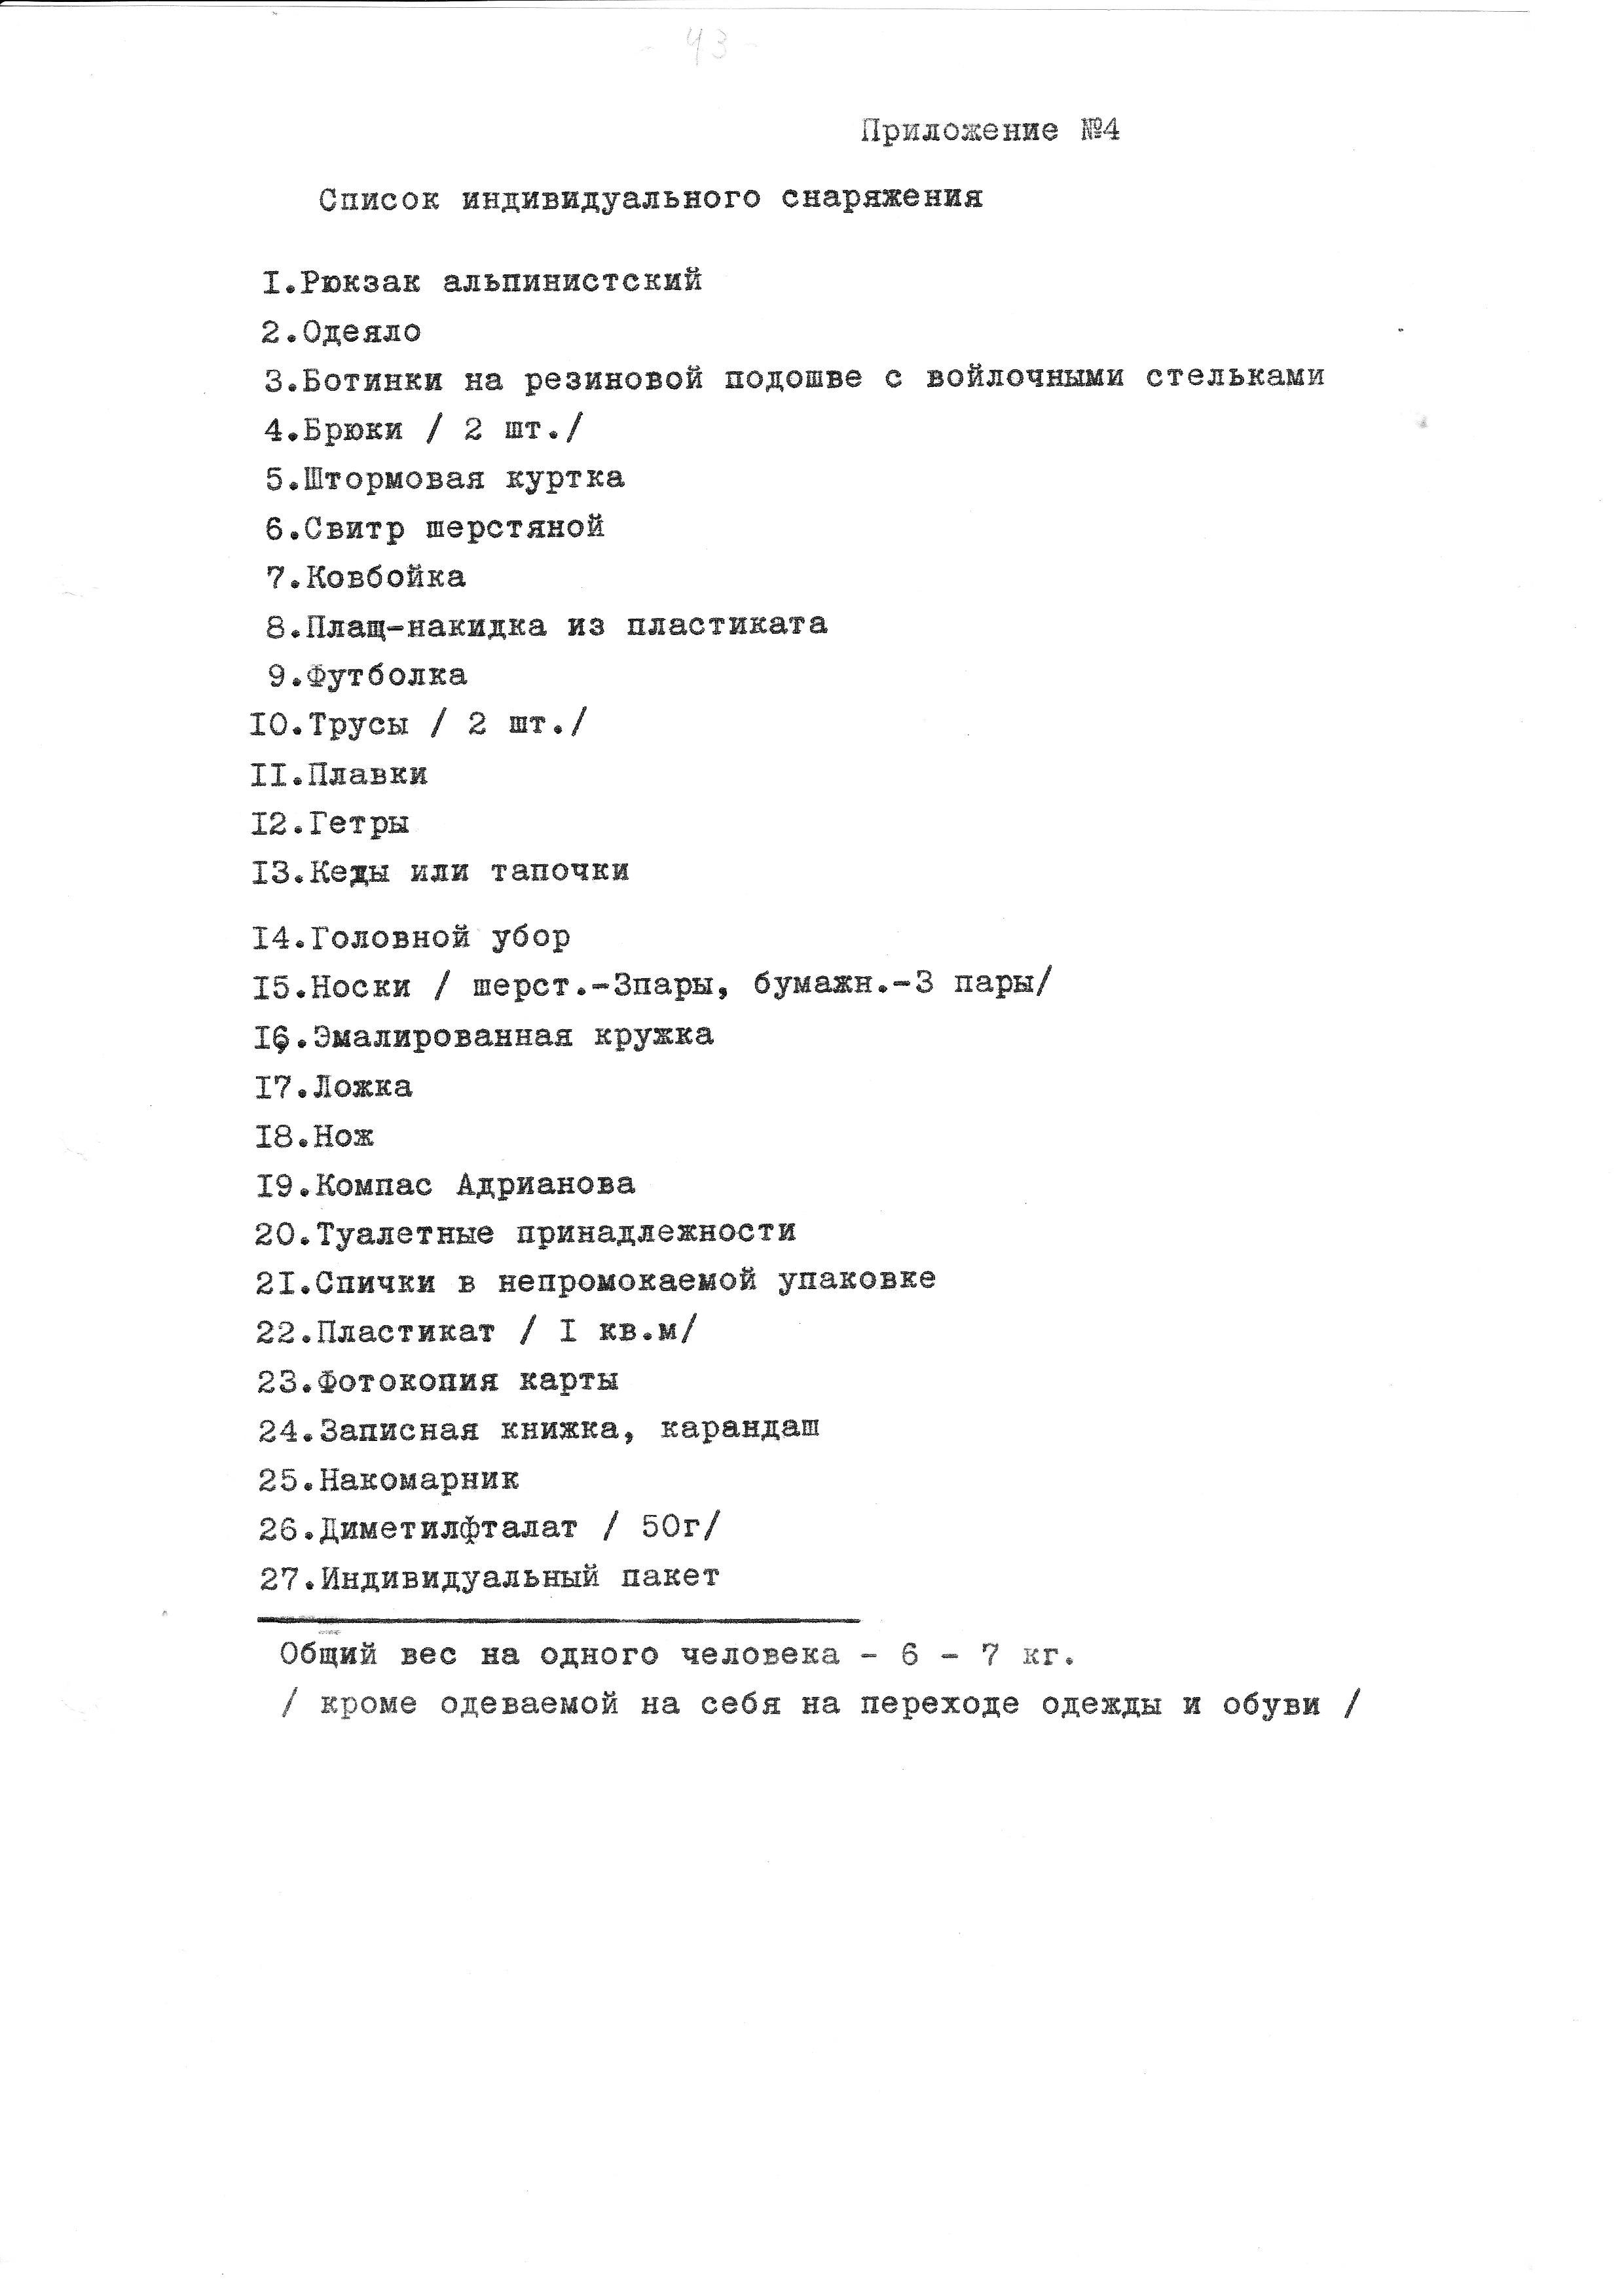 https://img-fotki.yandex.ru/get/3005/164520479.7e/0_e48da_4cd436ff_orig.jpg